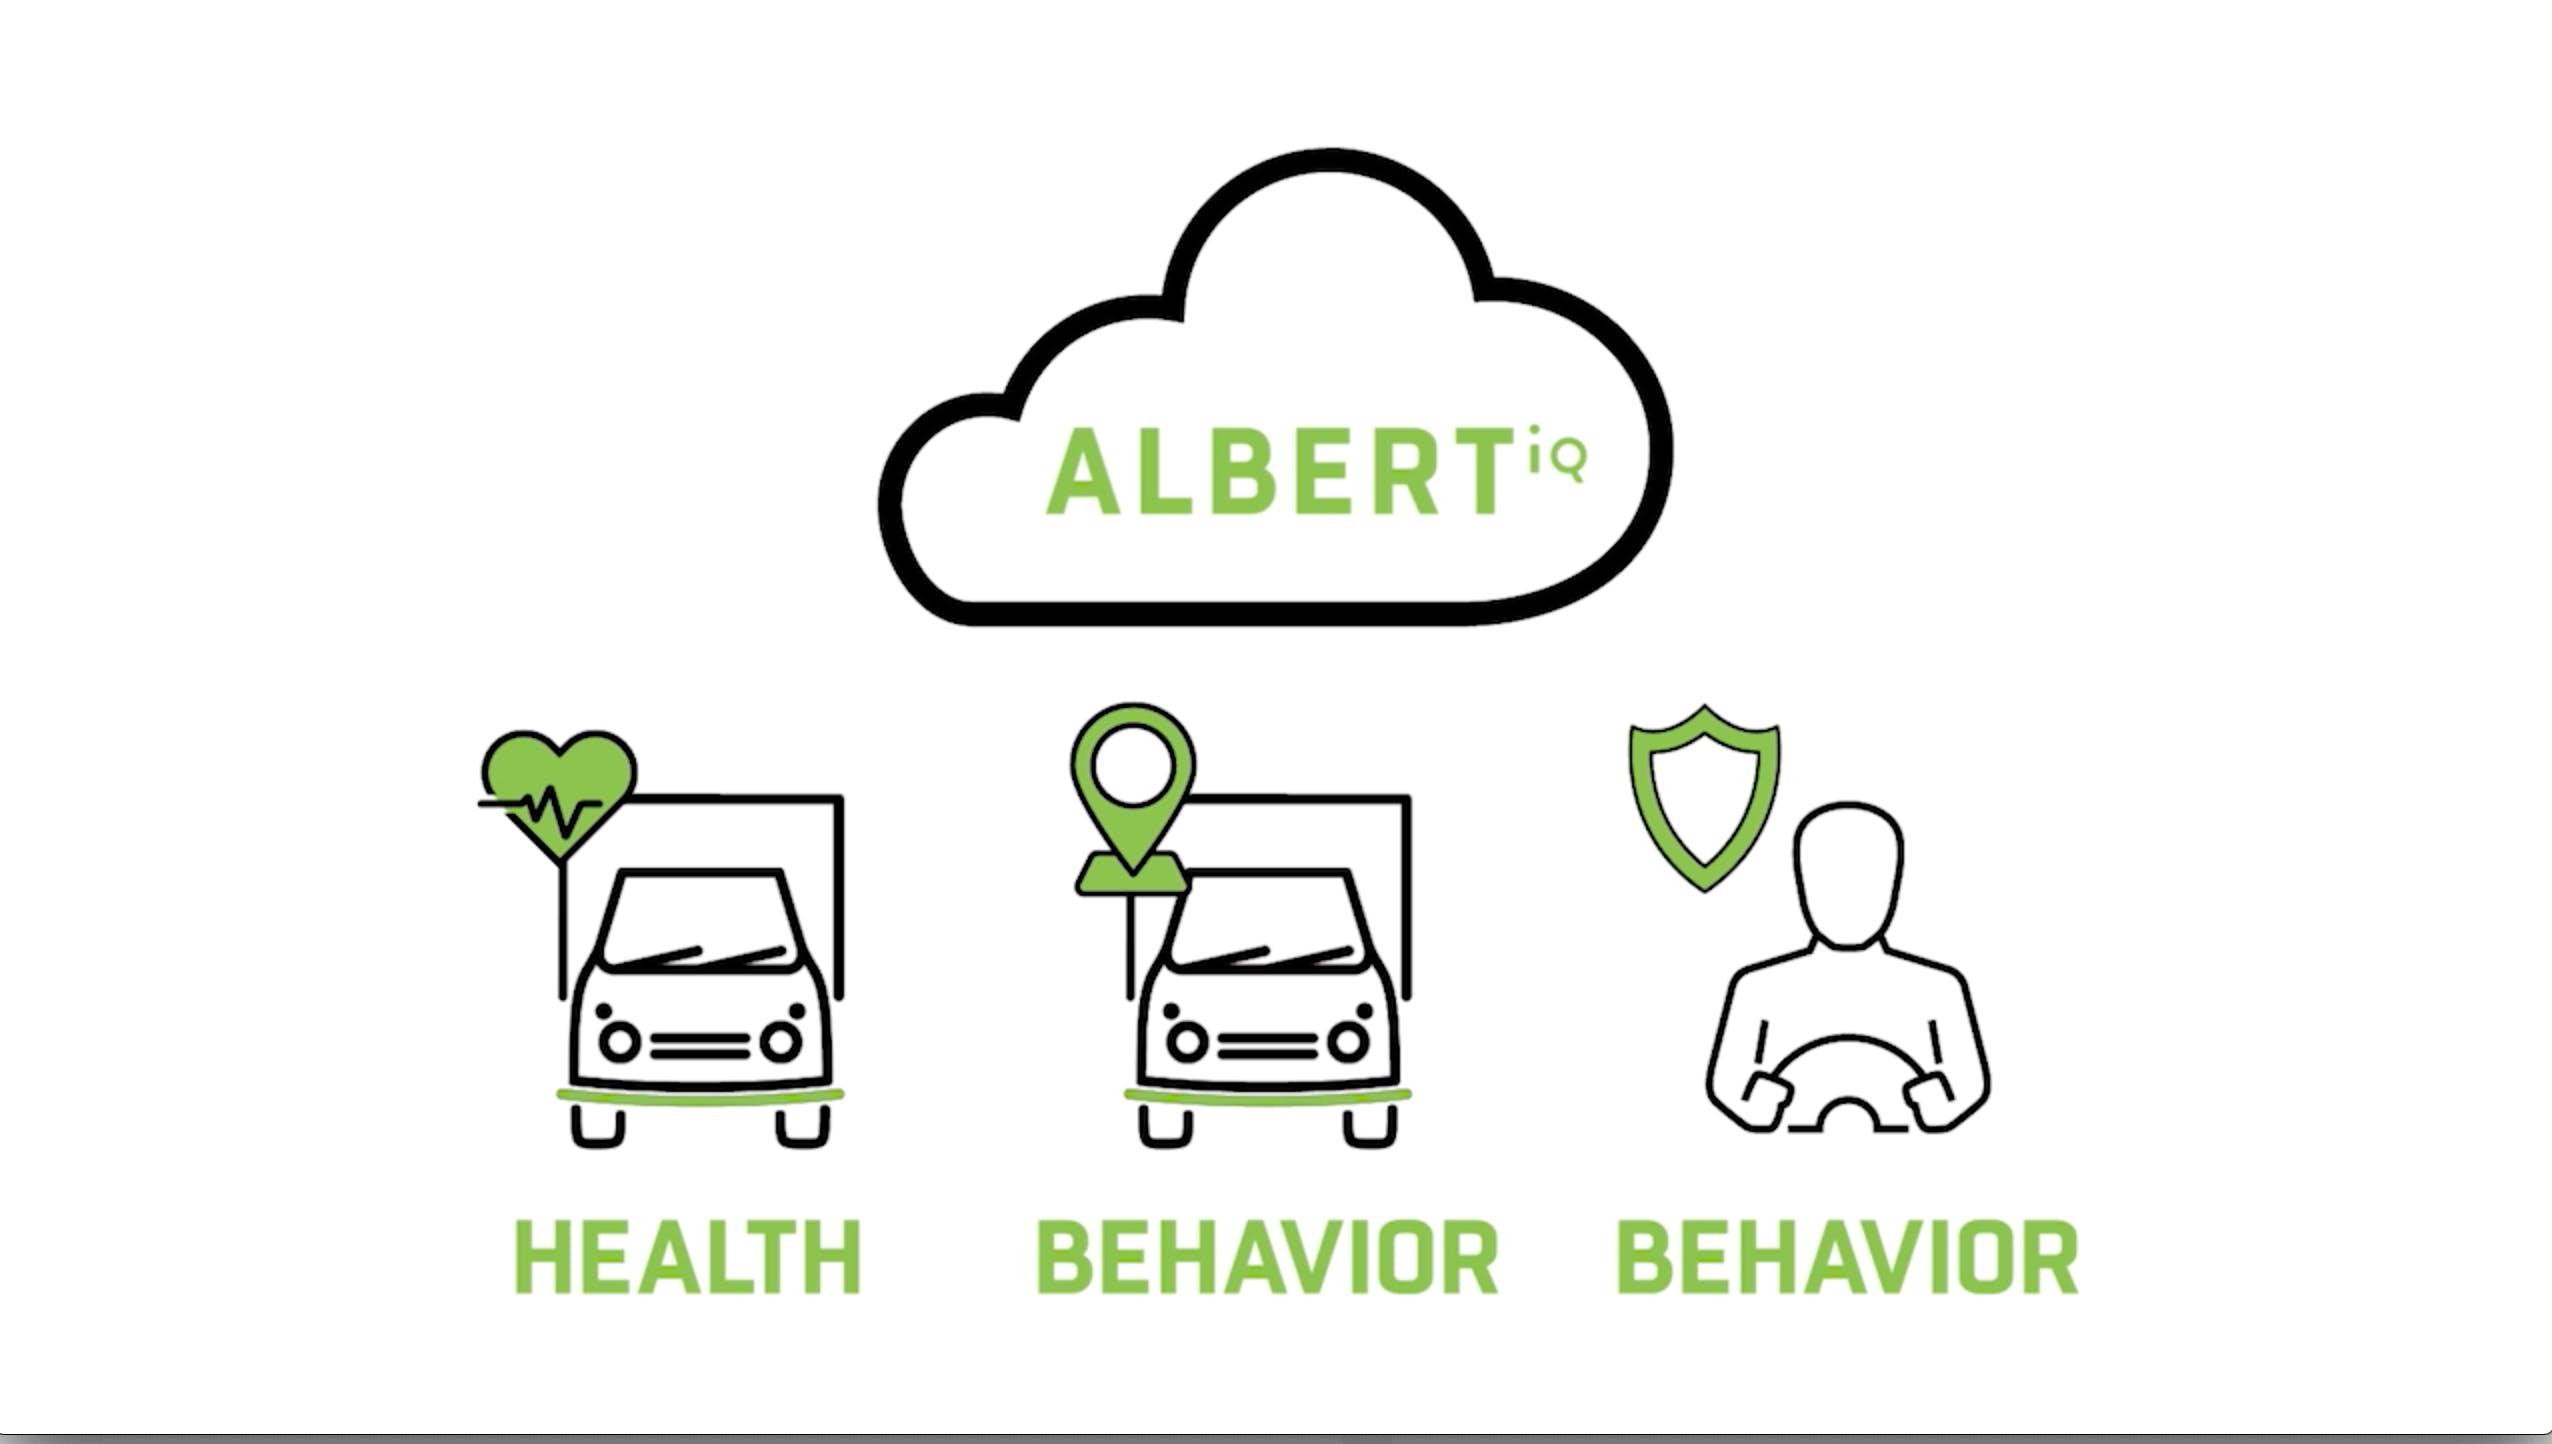 AlbertIQ Fleet Vehicle and Driver Monitoring by Mike Albert